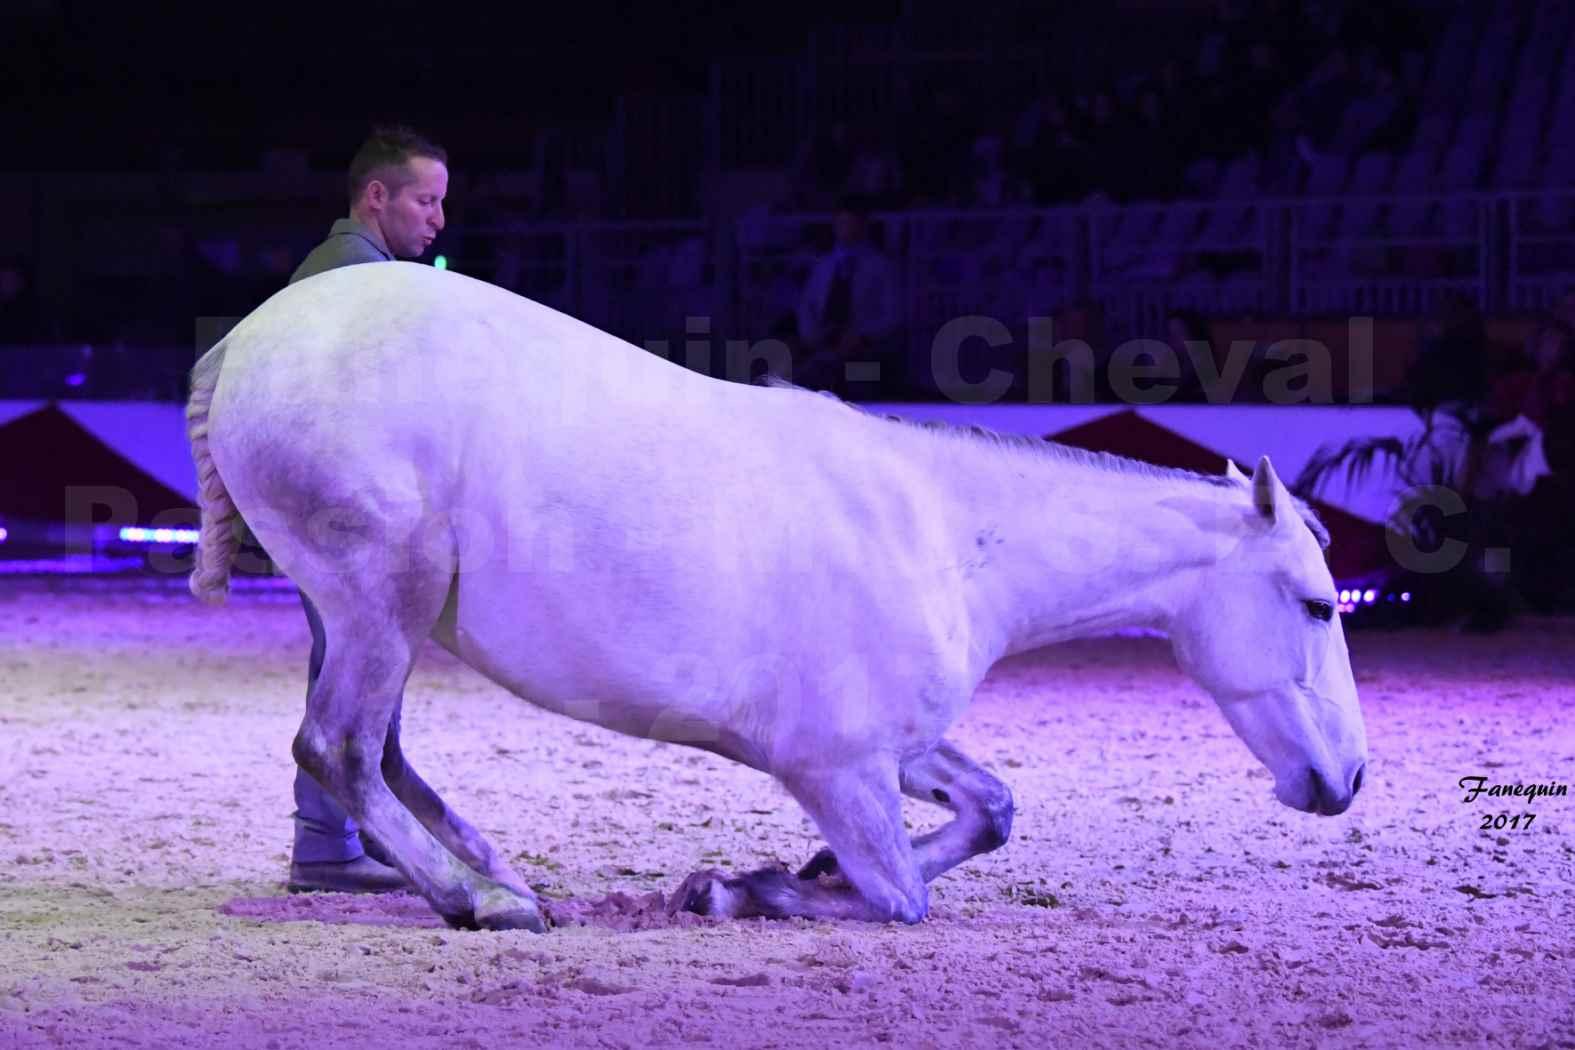 Cheval Passion 2017 - M. I. S. E. C. - Ludovic LONGO & 1 cheval en liberté - 10